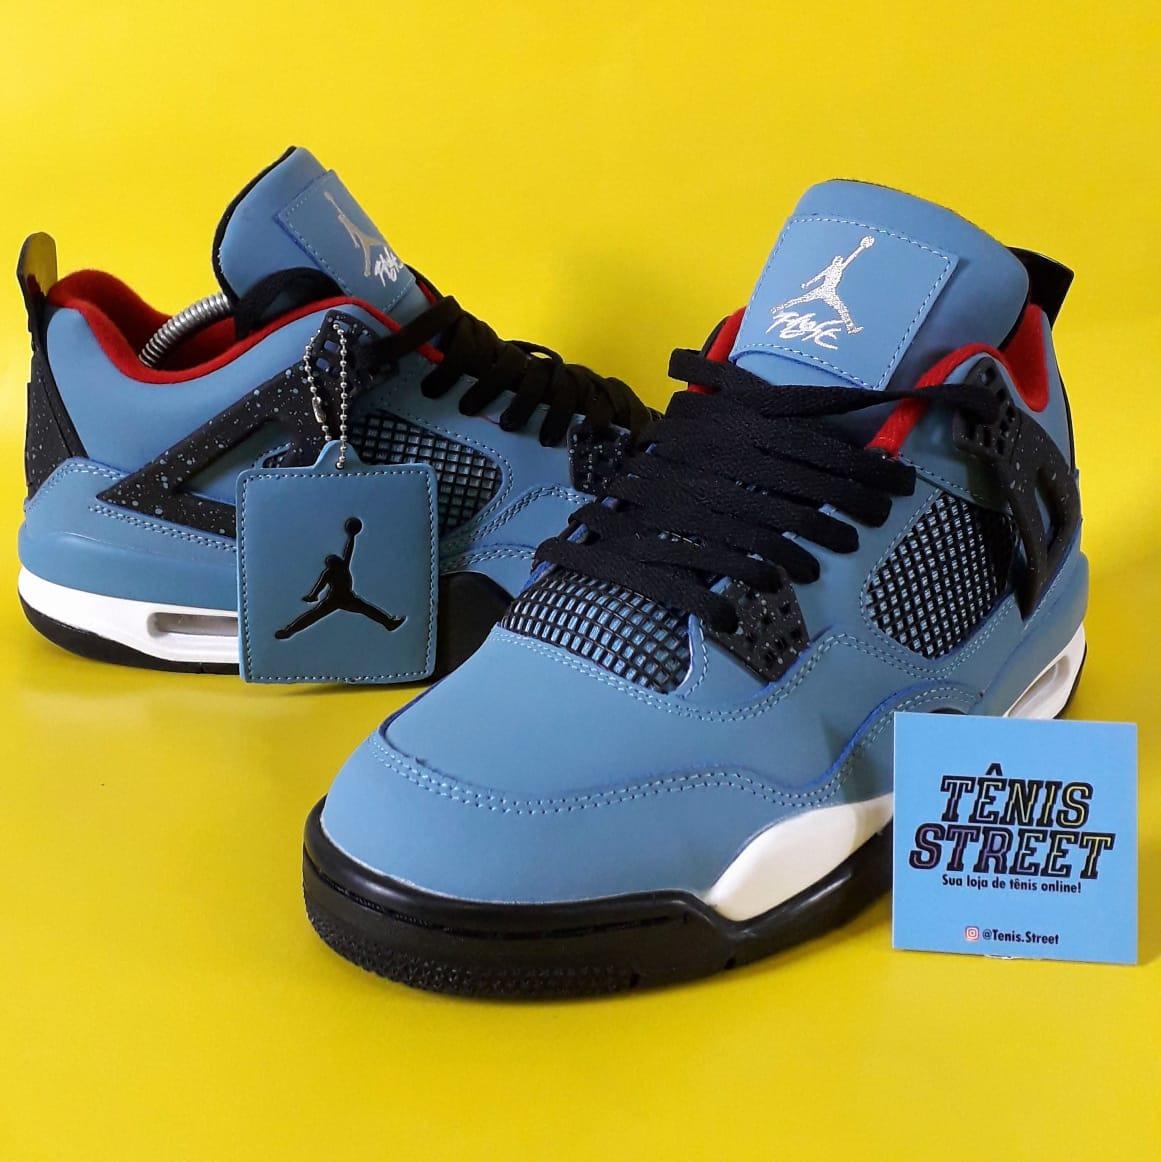 half off 18132 c4934 Tênis Nike Air Jordan 4 X Travis Scott ( Jack Cactus ) Azul - R  760,00 em  Mercado Livre